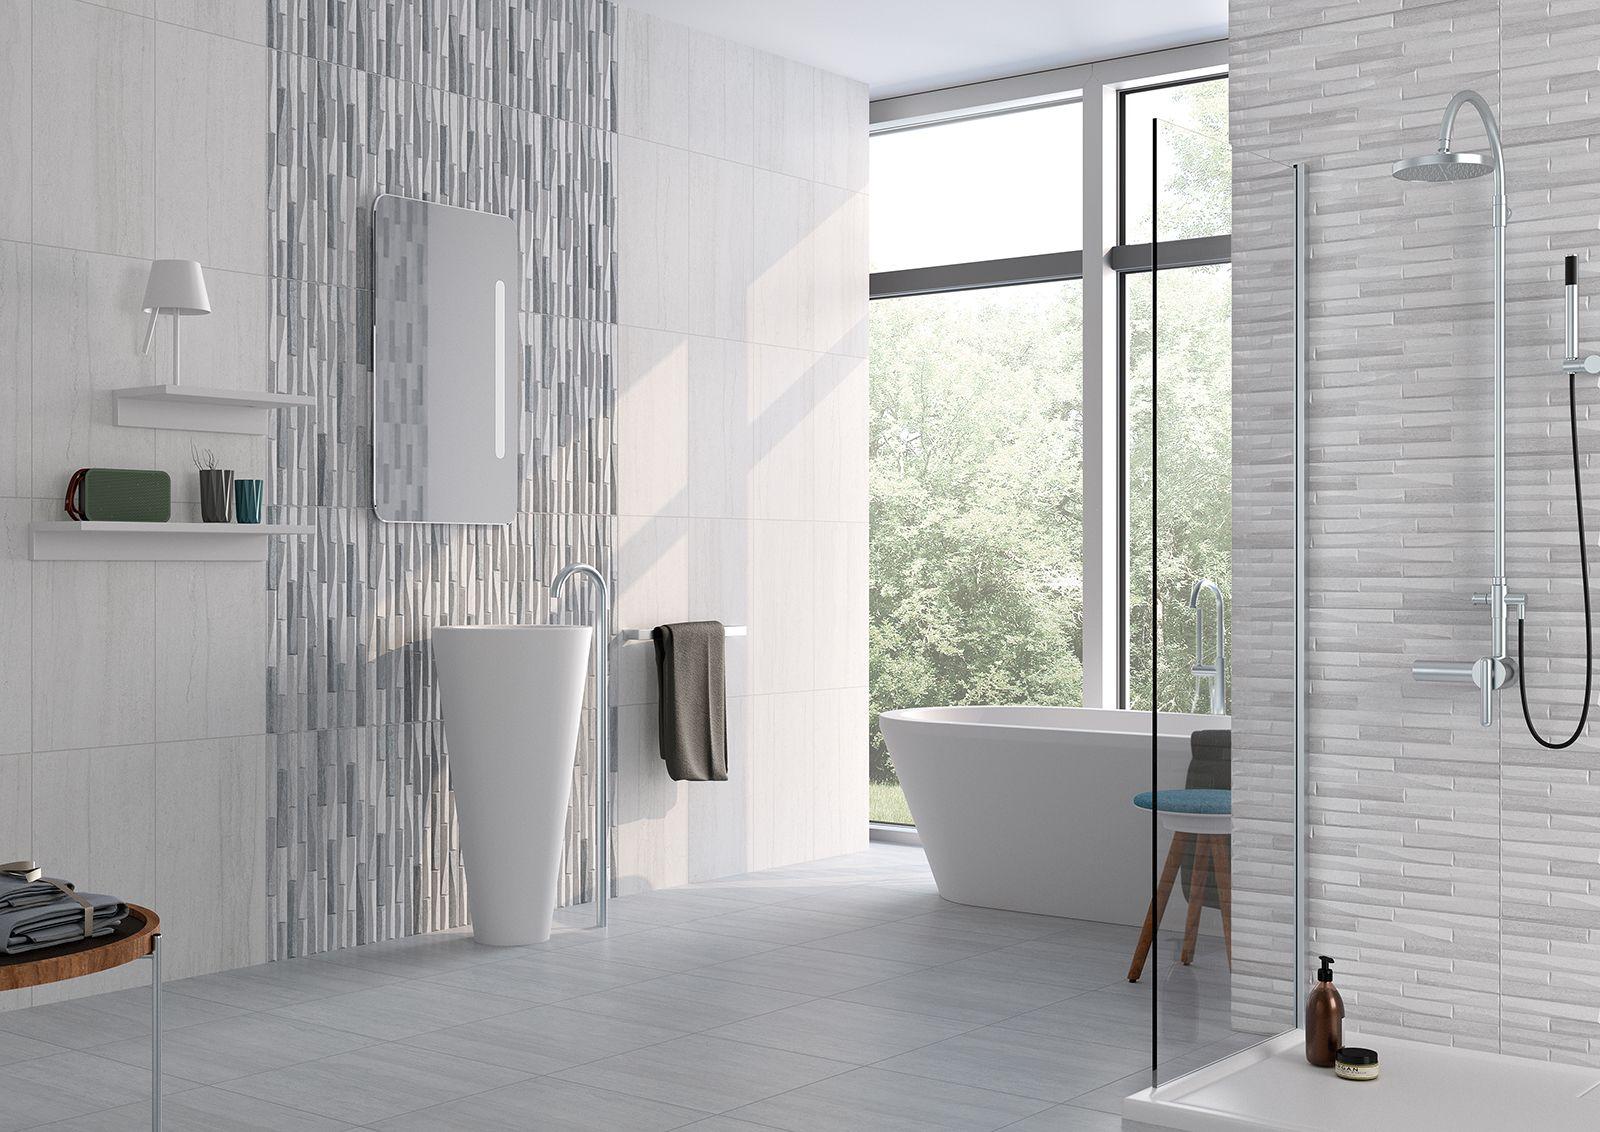 How to tile a bathroom wall   Precious Tiling